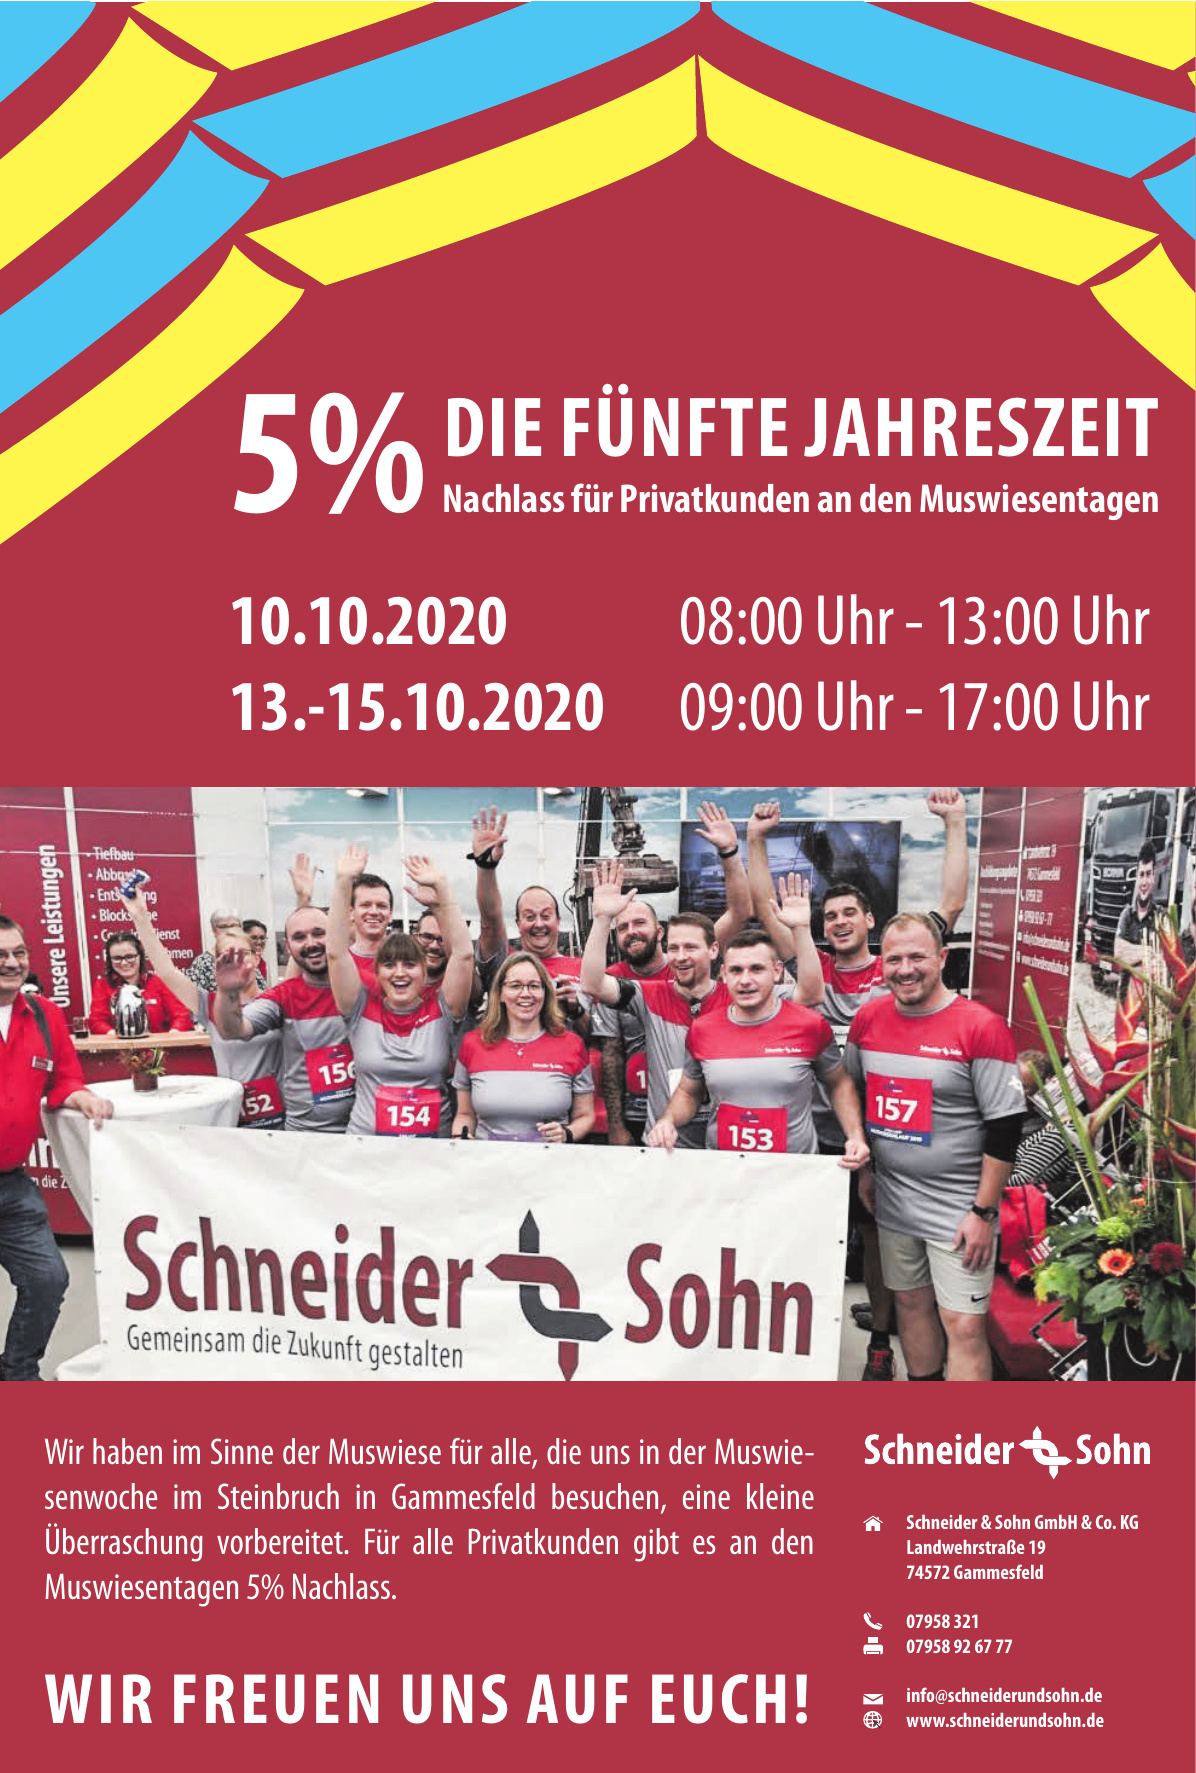 Schneider & Sohn GmbH Co. KG